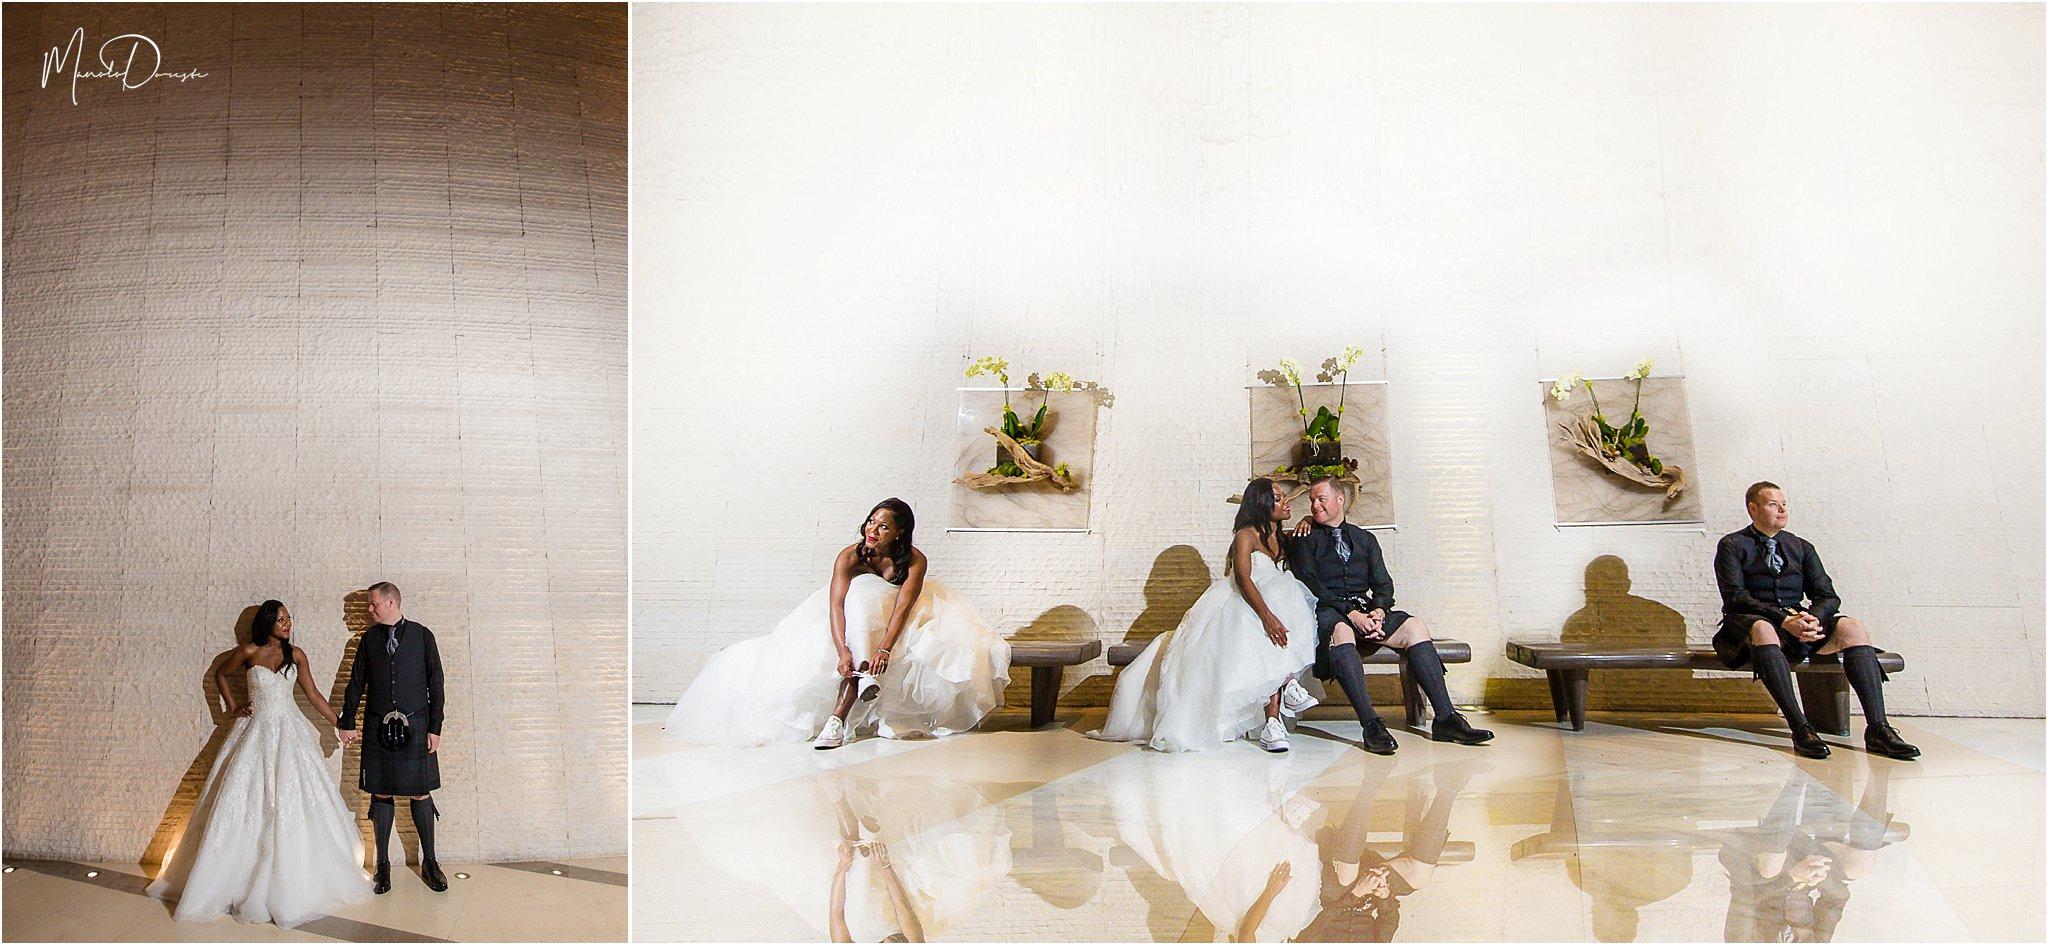 0133_ManoloDoreste_InFocusStudios_Wedding_Family_Photography_Miami_MiamiPhotographer.jpg